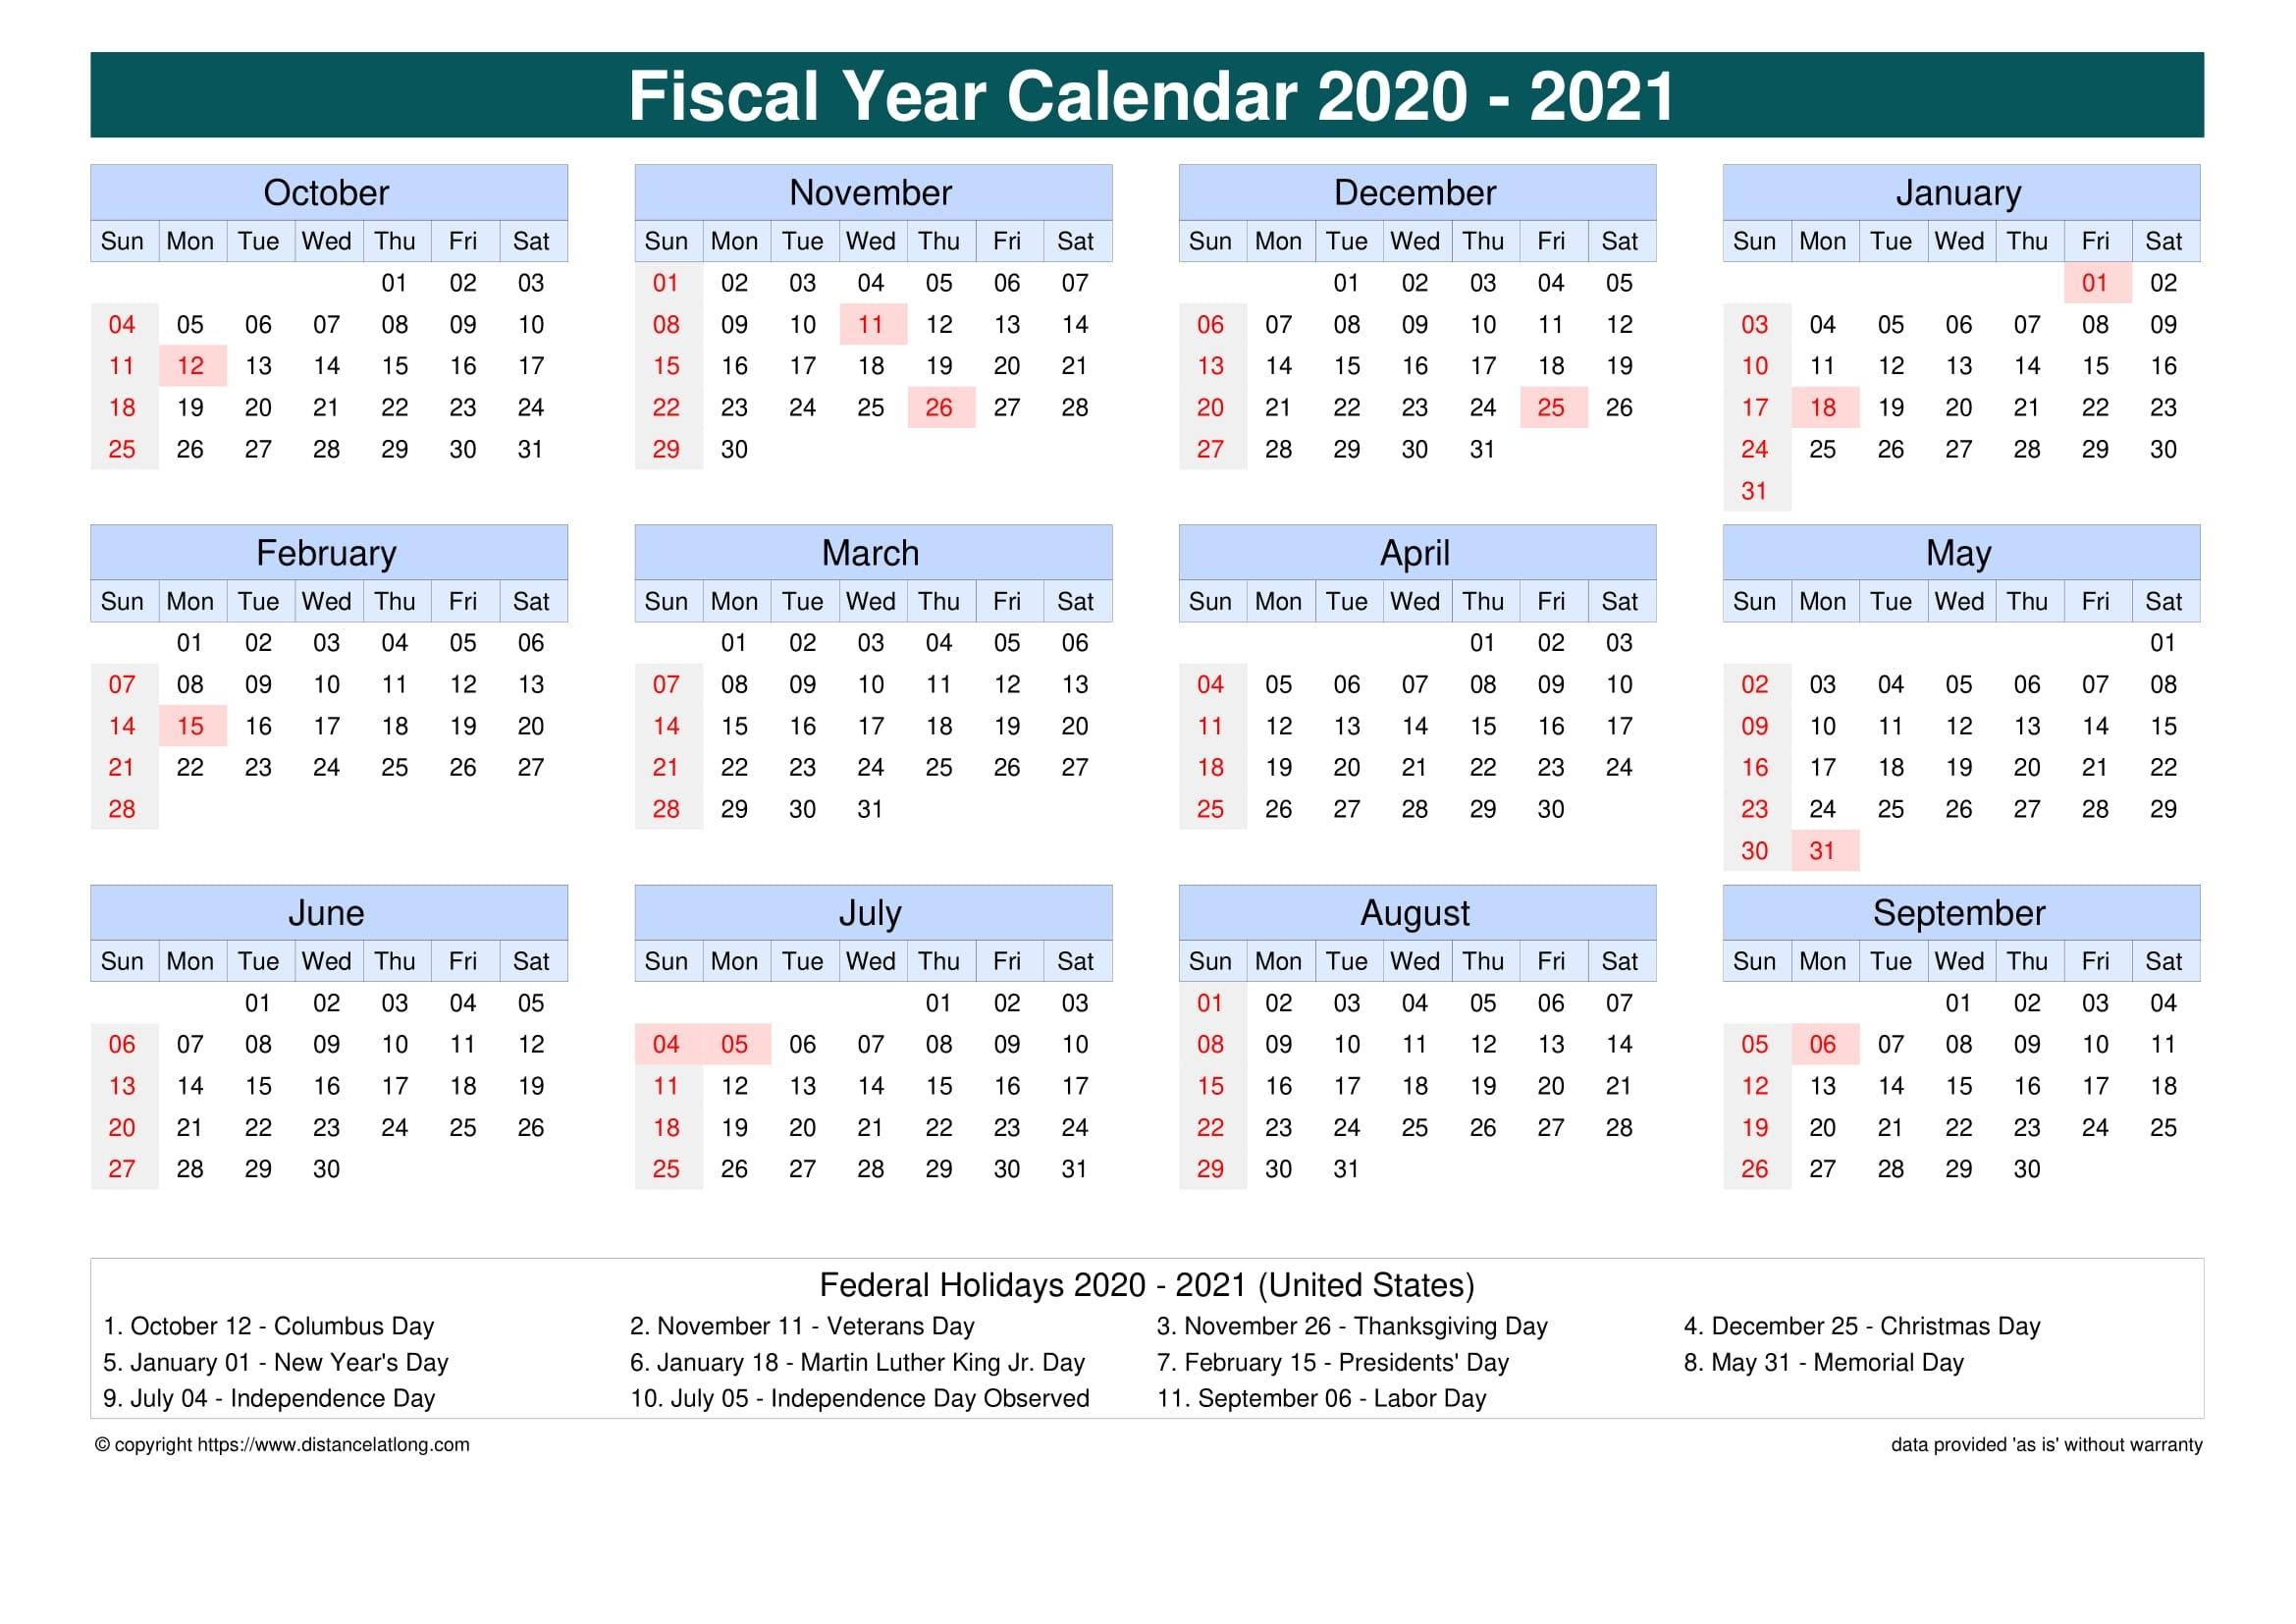 Fiscal Year 2020-2021 Calendar Templates, Free Printable in Financial Calendar 2019-2020 In Weeks